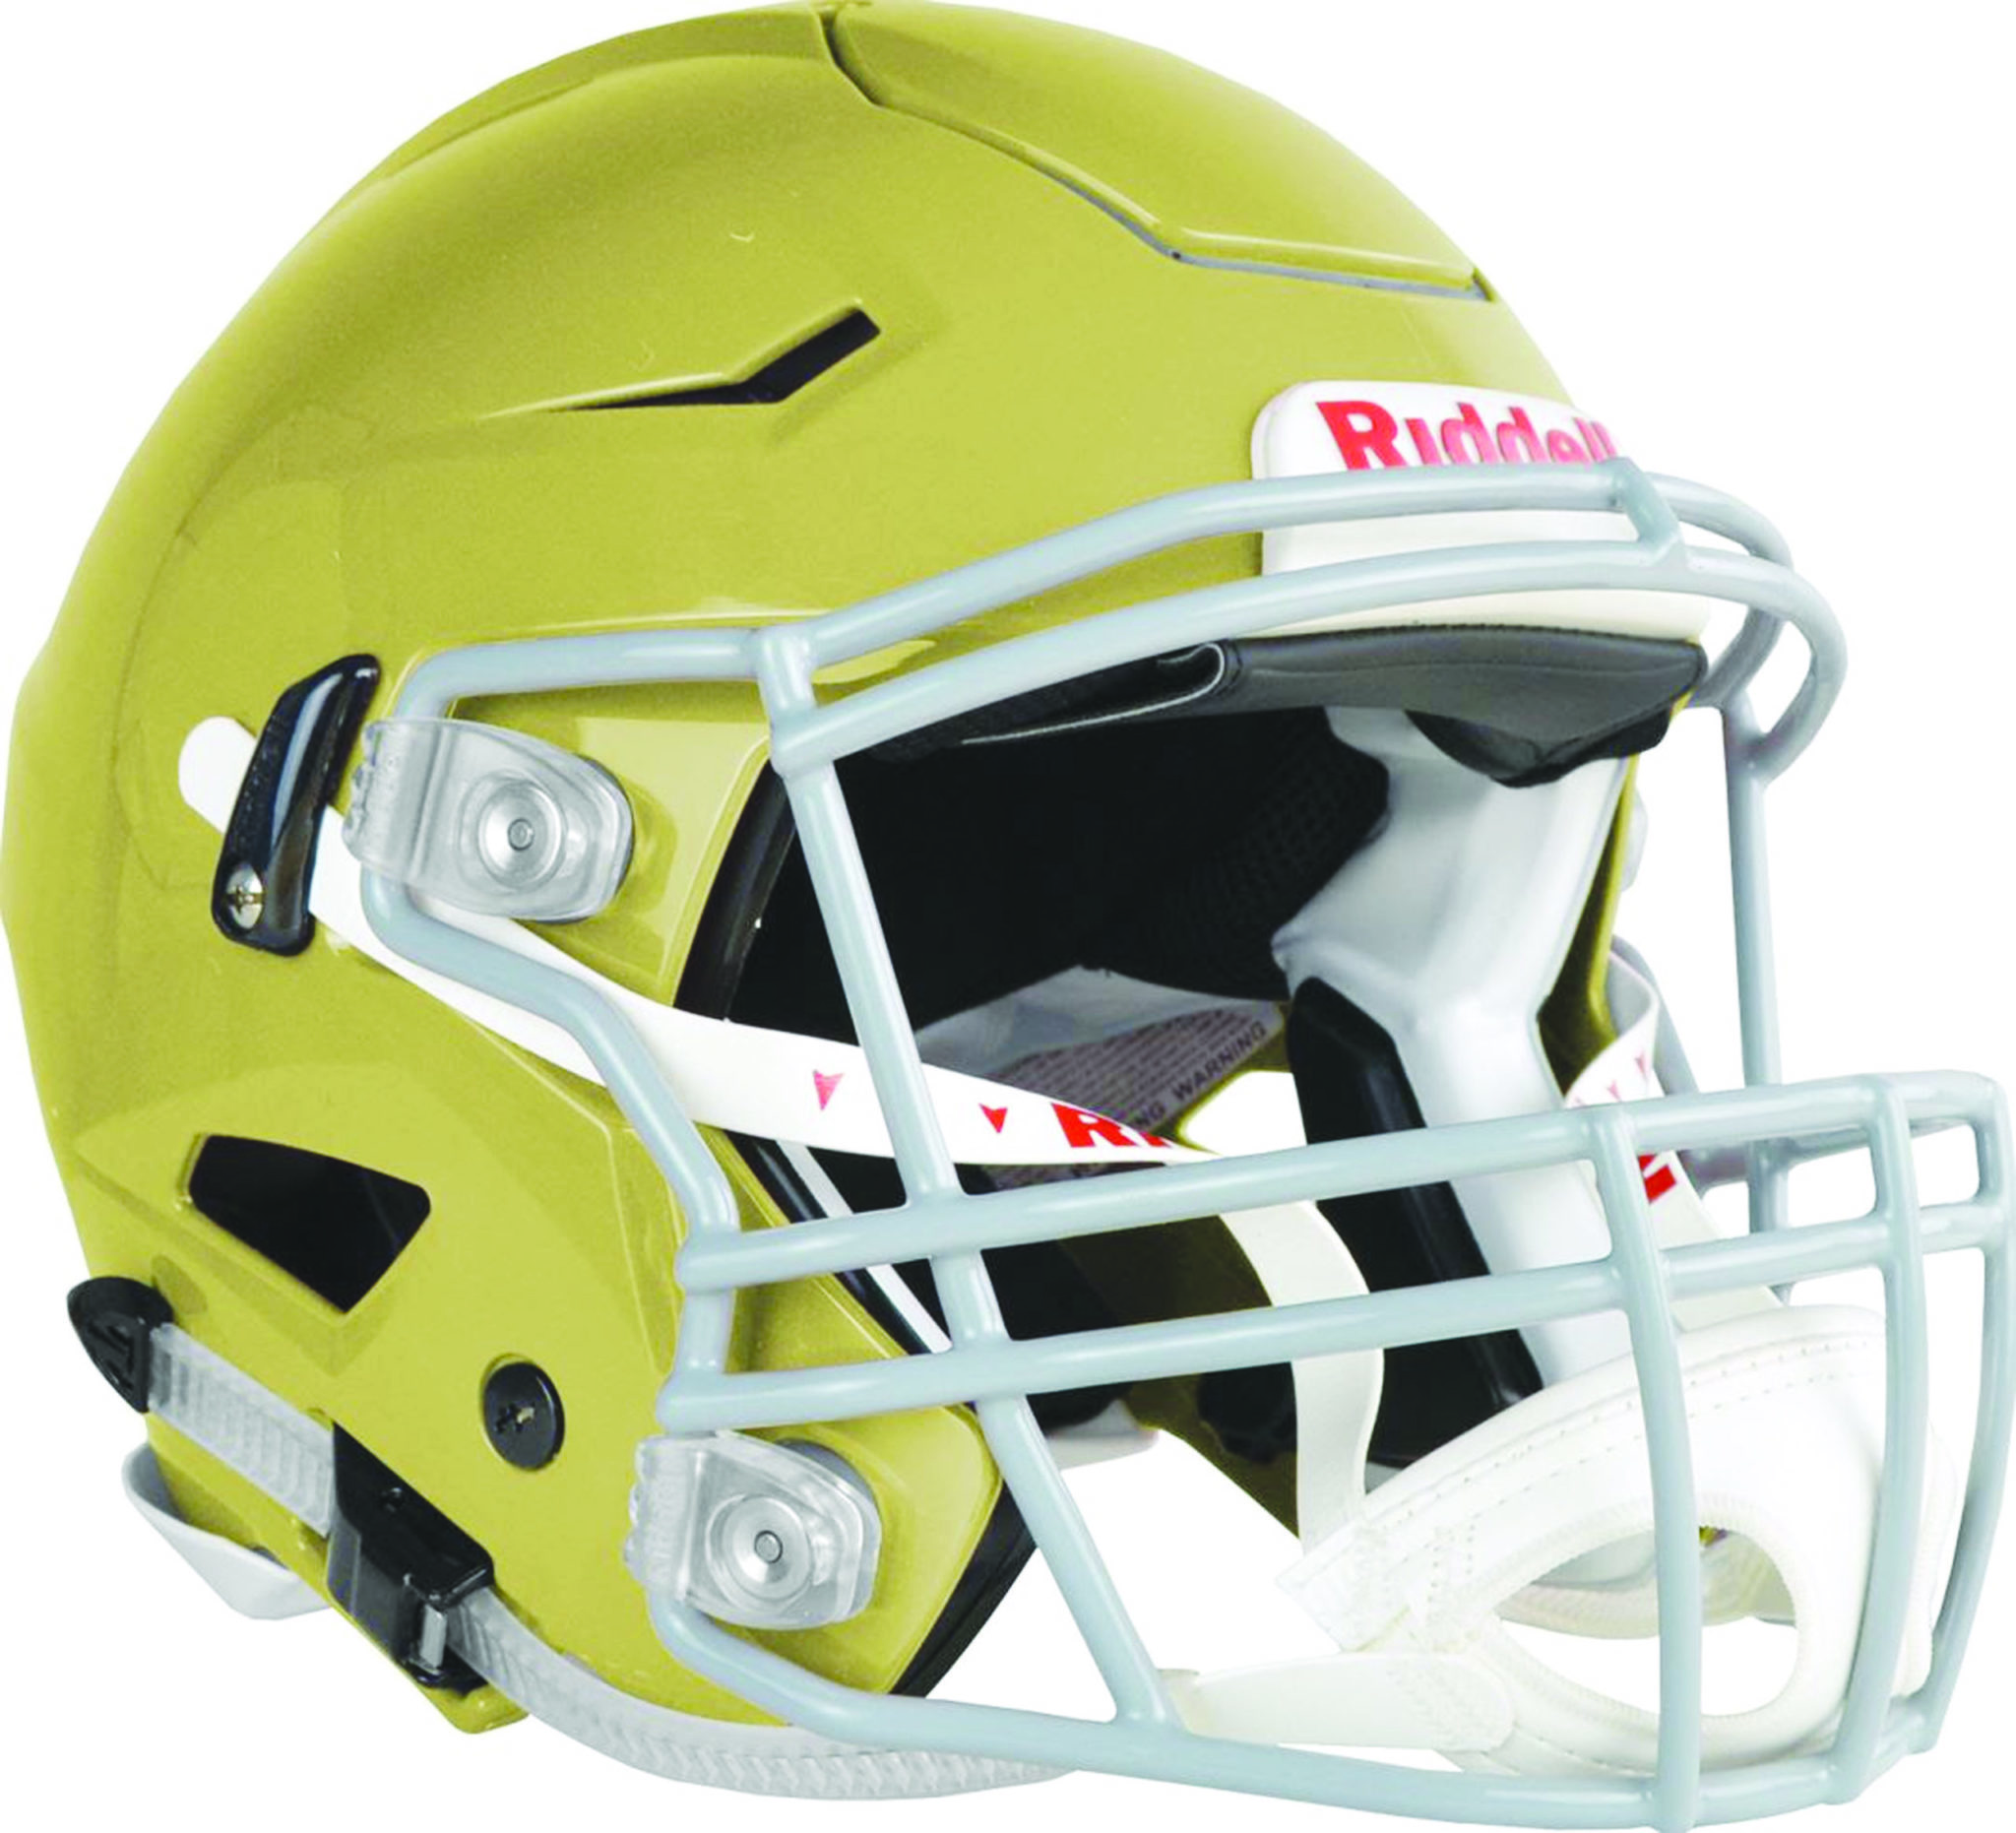 Football club raising funds for new helmets